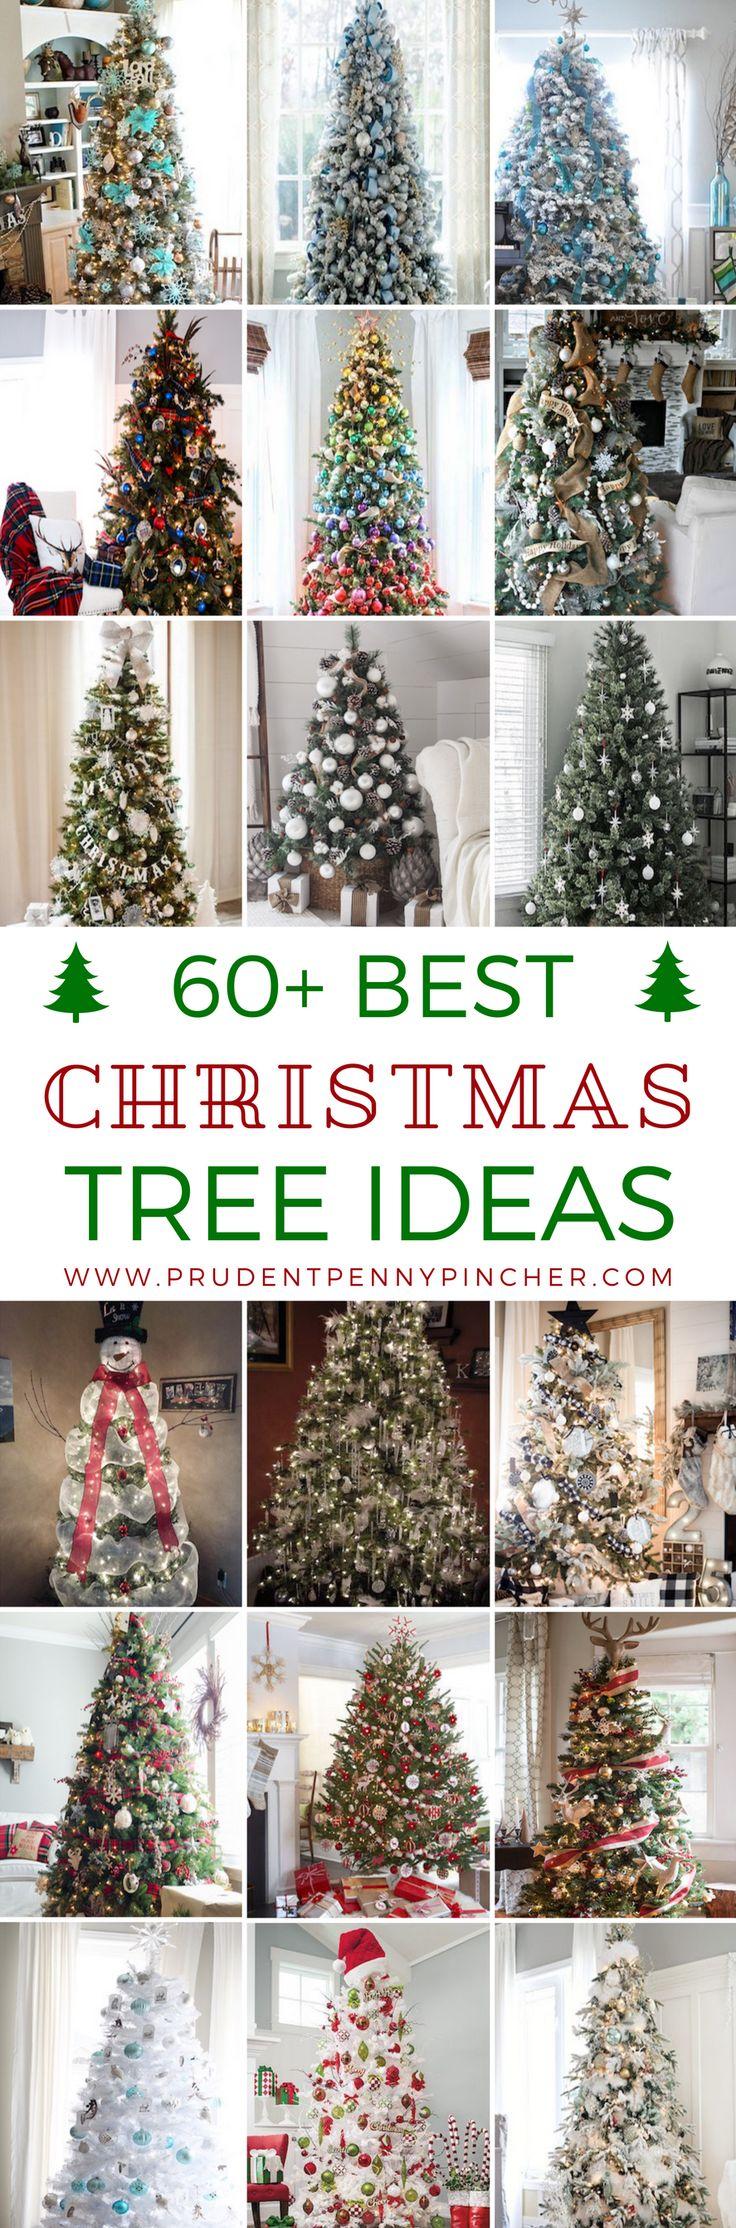 60 Best Christmas Tree Ideas 1210 best